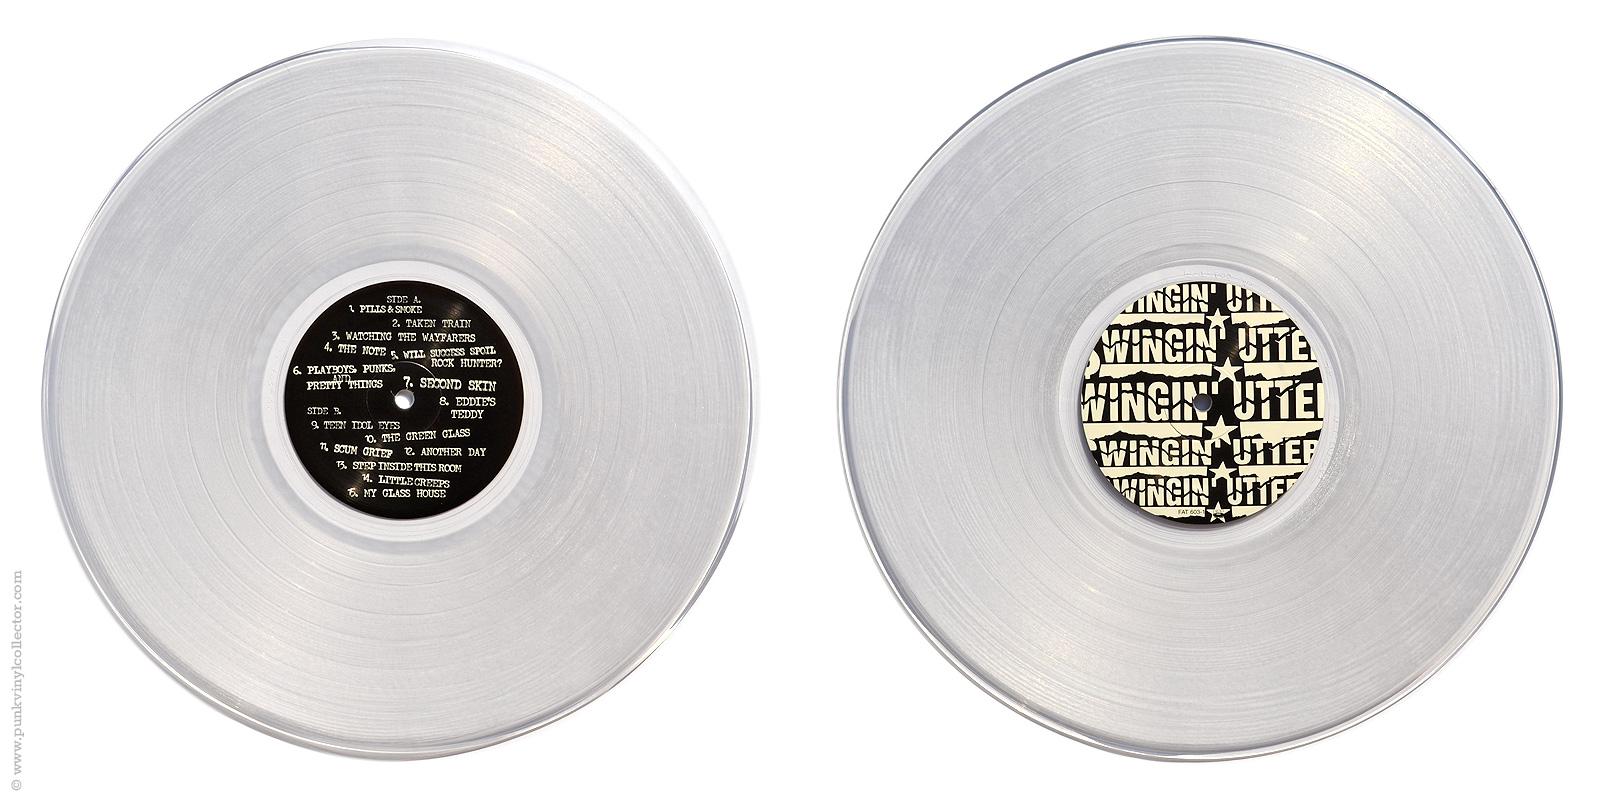 Swingin' Utters – Punk Vinyl Collector